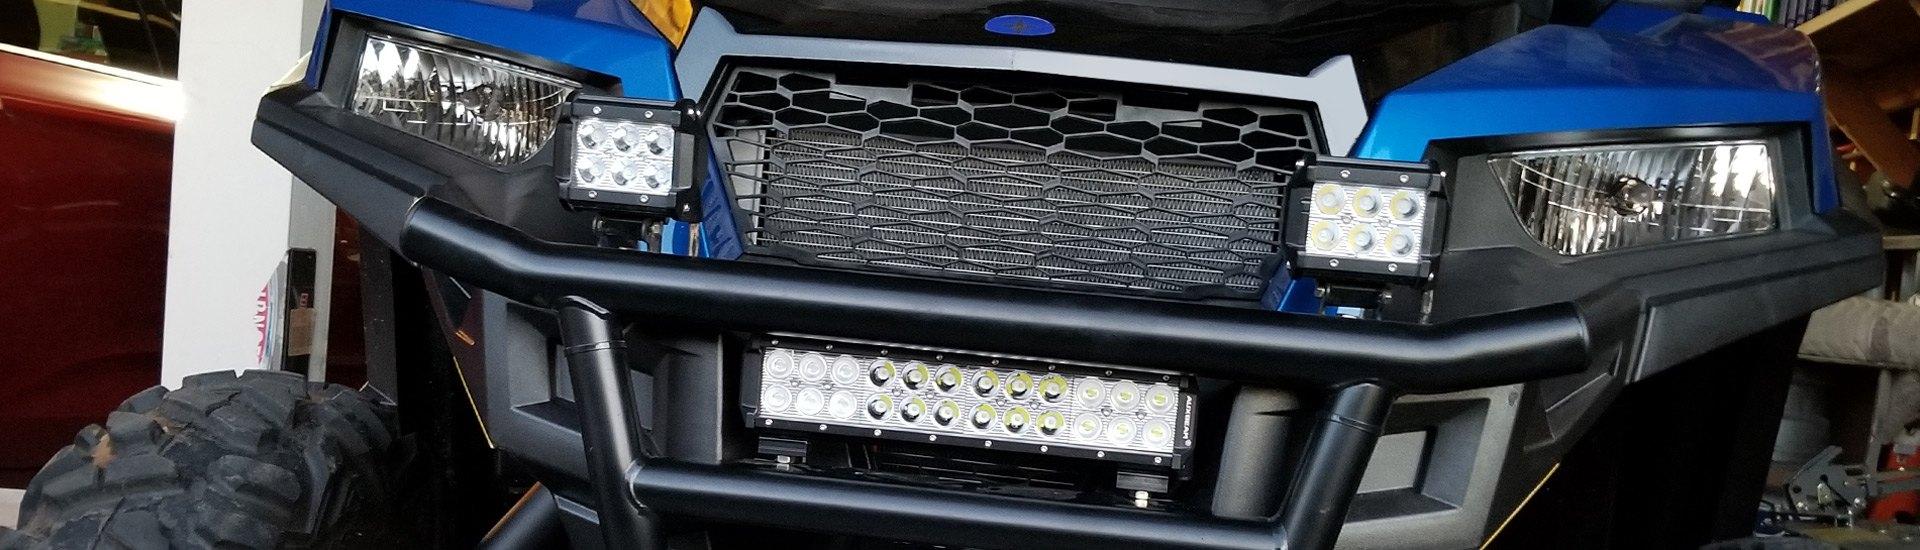 Off-Road Powersports Lights | ATV, UTV, Snowmobile